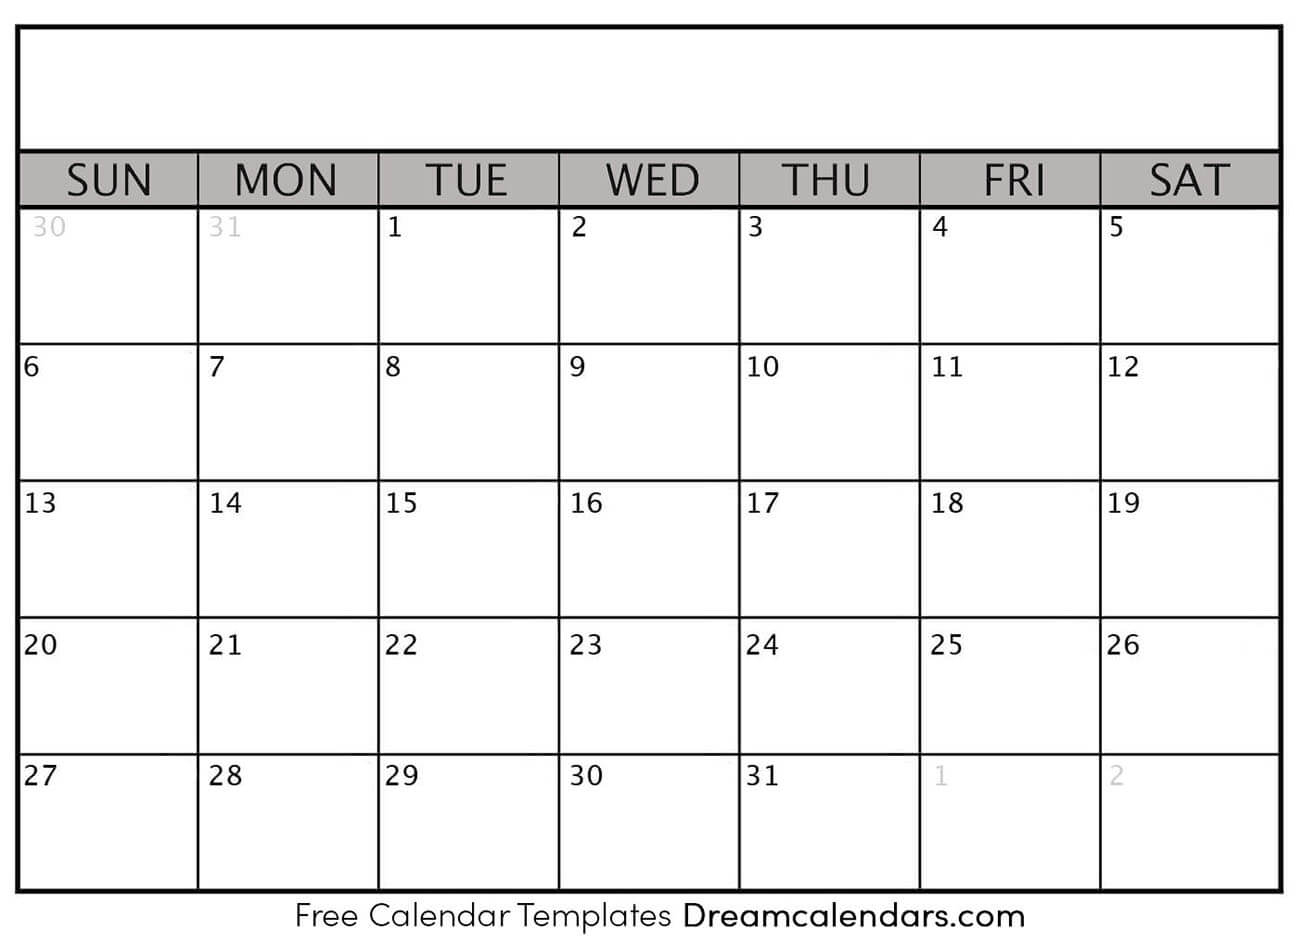 Blank Printable Calendar Templates  Kofi ❤️ Where with Empty Printable Calendar